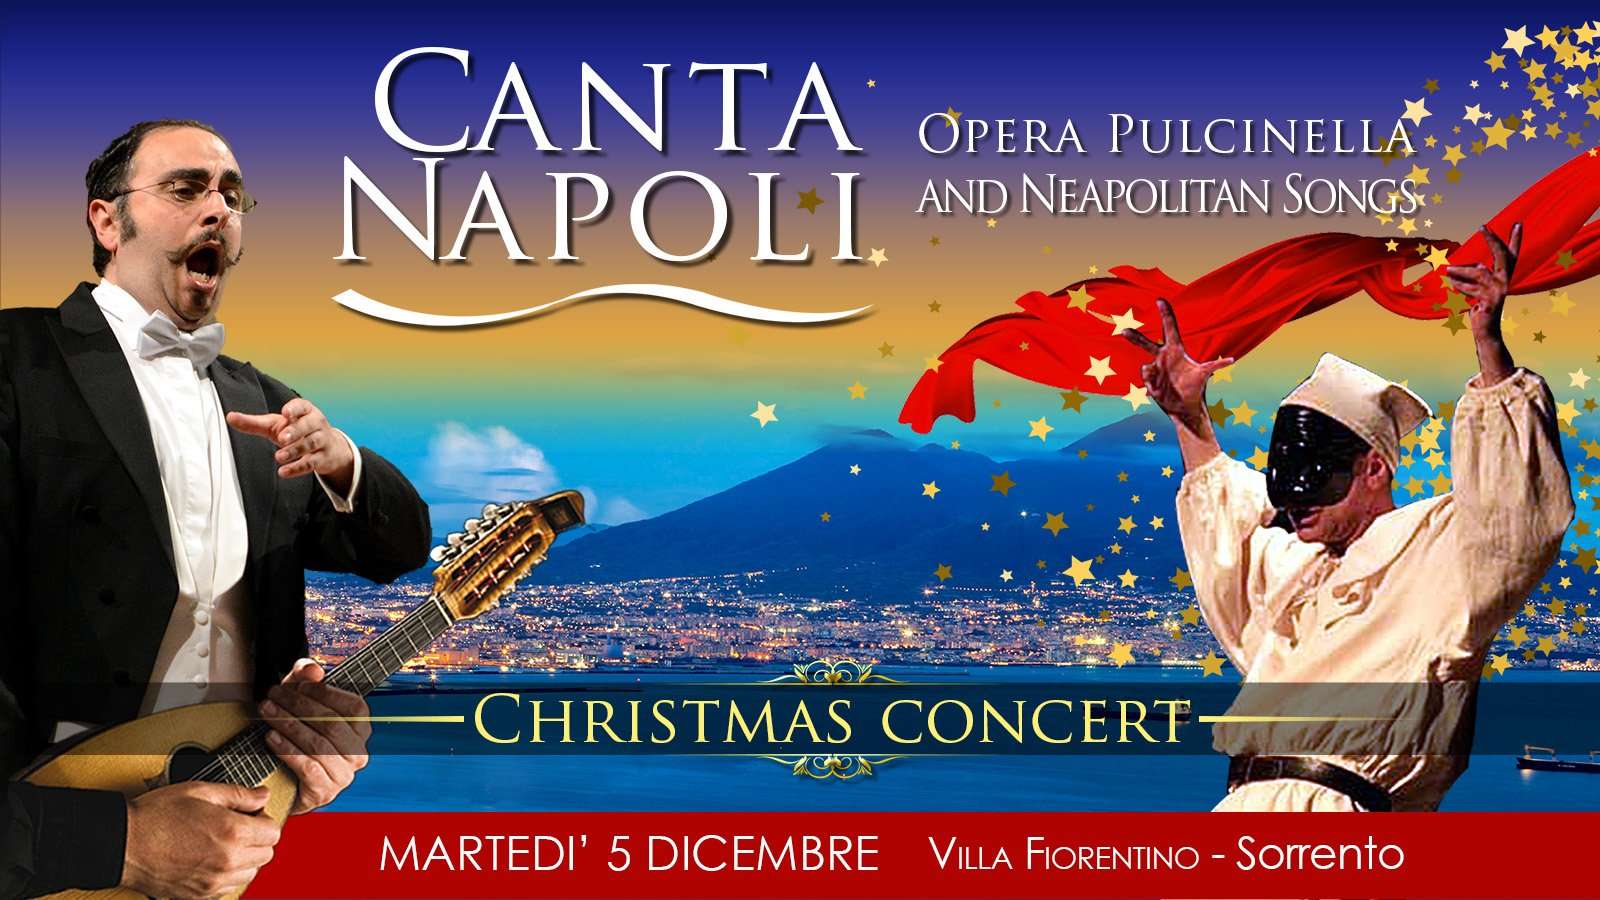 Canta Napoli in Sorrento Christmas Concert